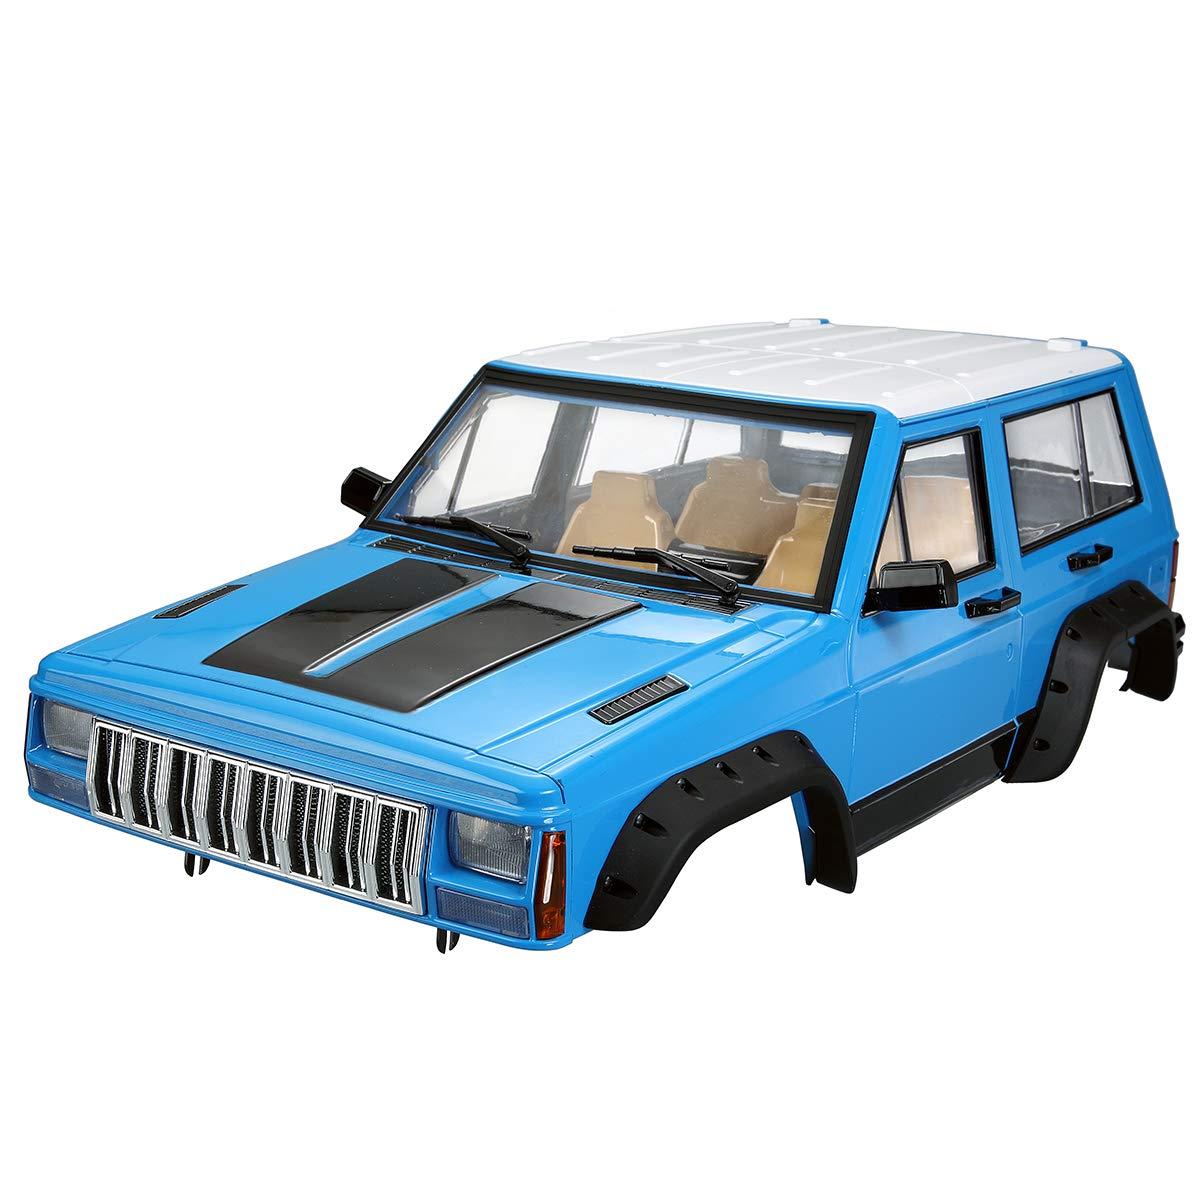 PinShang 313 mm Radstand Autokarosserie-Set Zubehör für Axial SCX10 RC4WD D90 RC Car 1 10 Rock Crawler Teile rot Blau